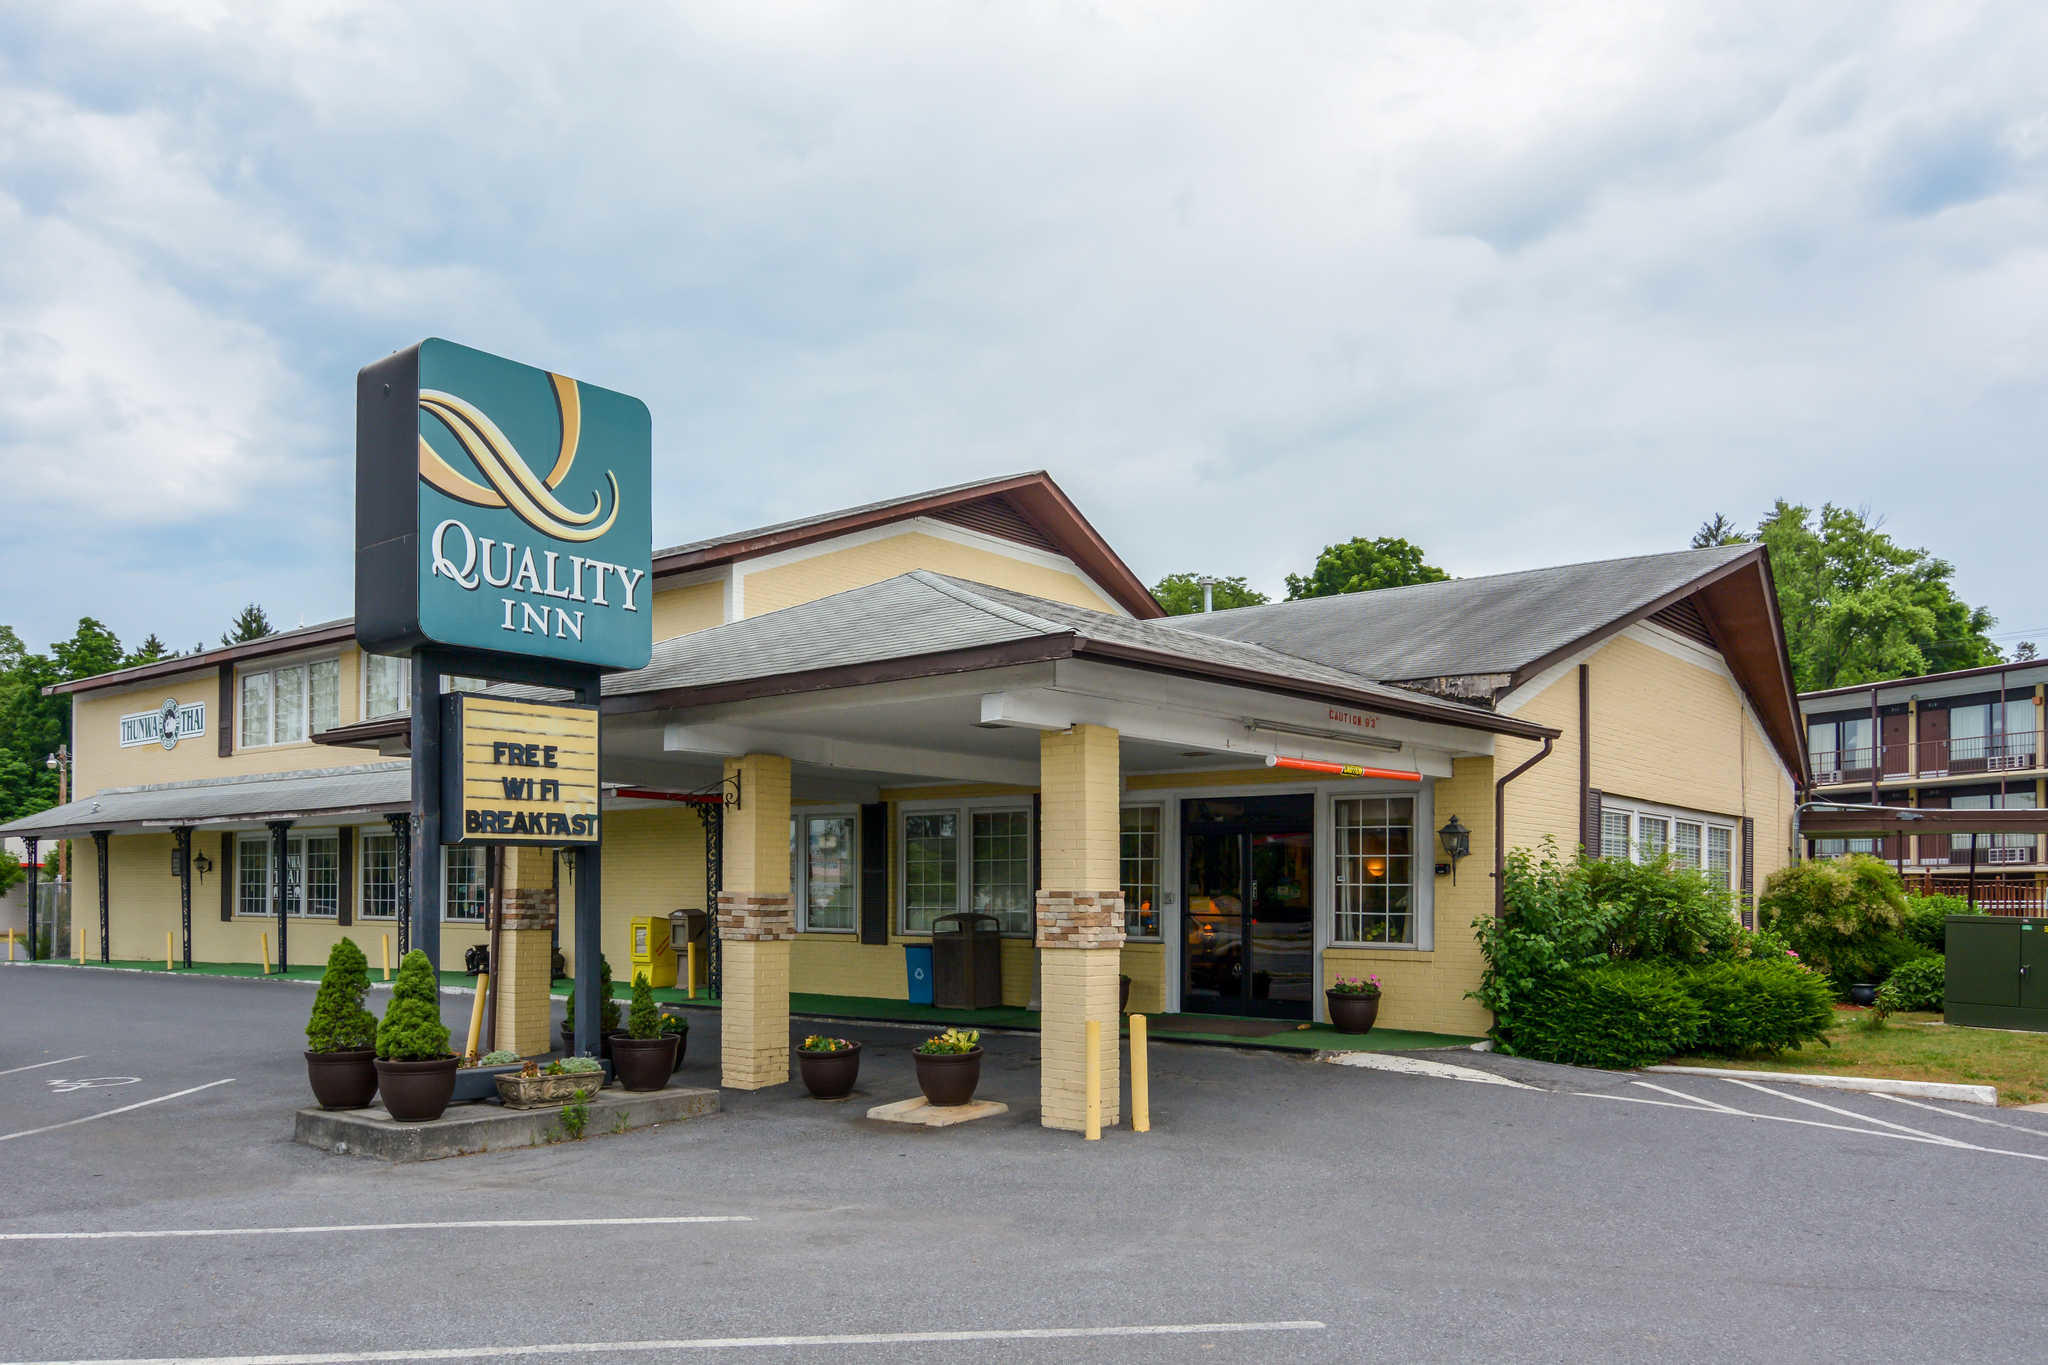 Quality Inn Skyline Drive image 1